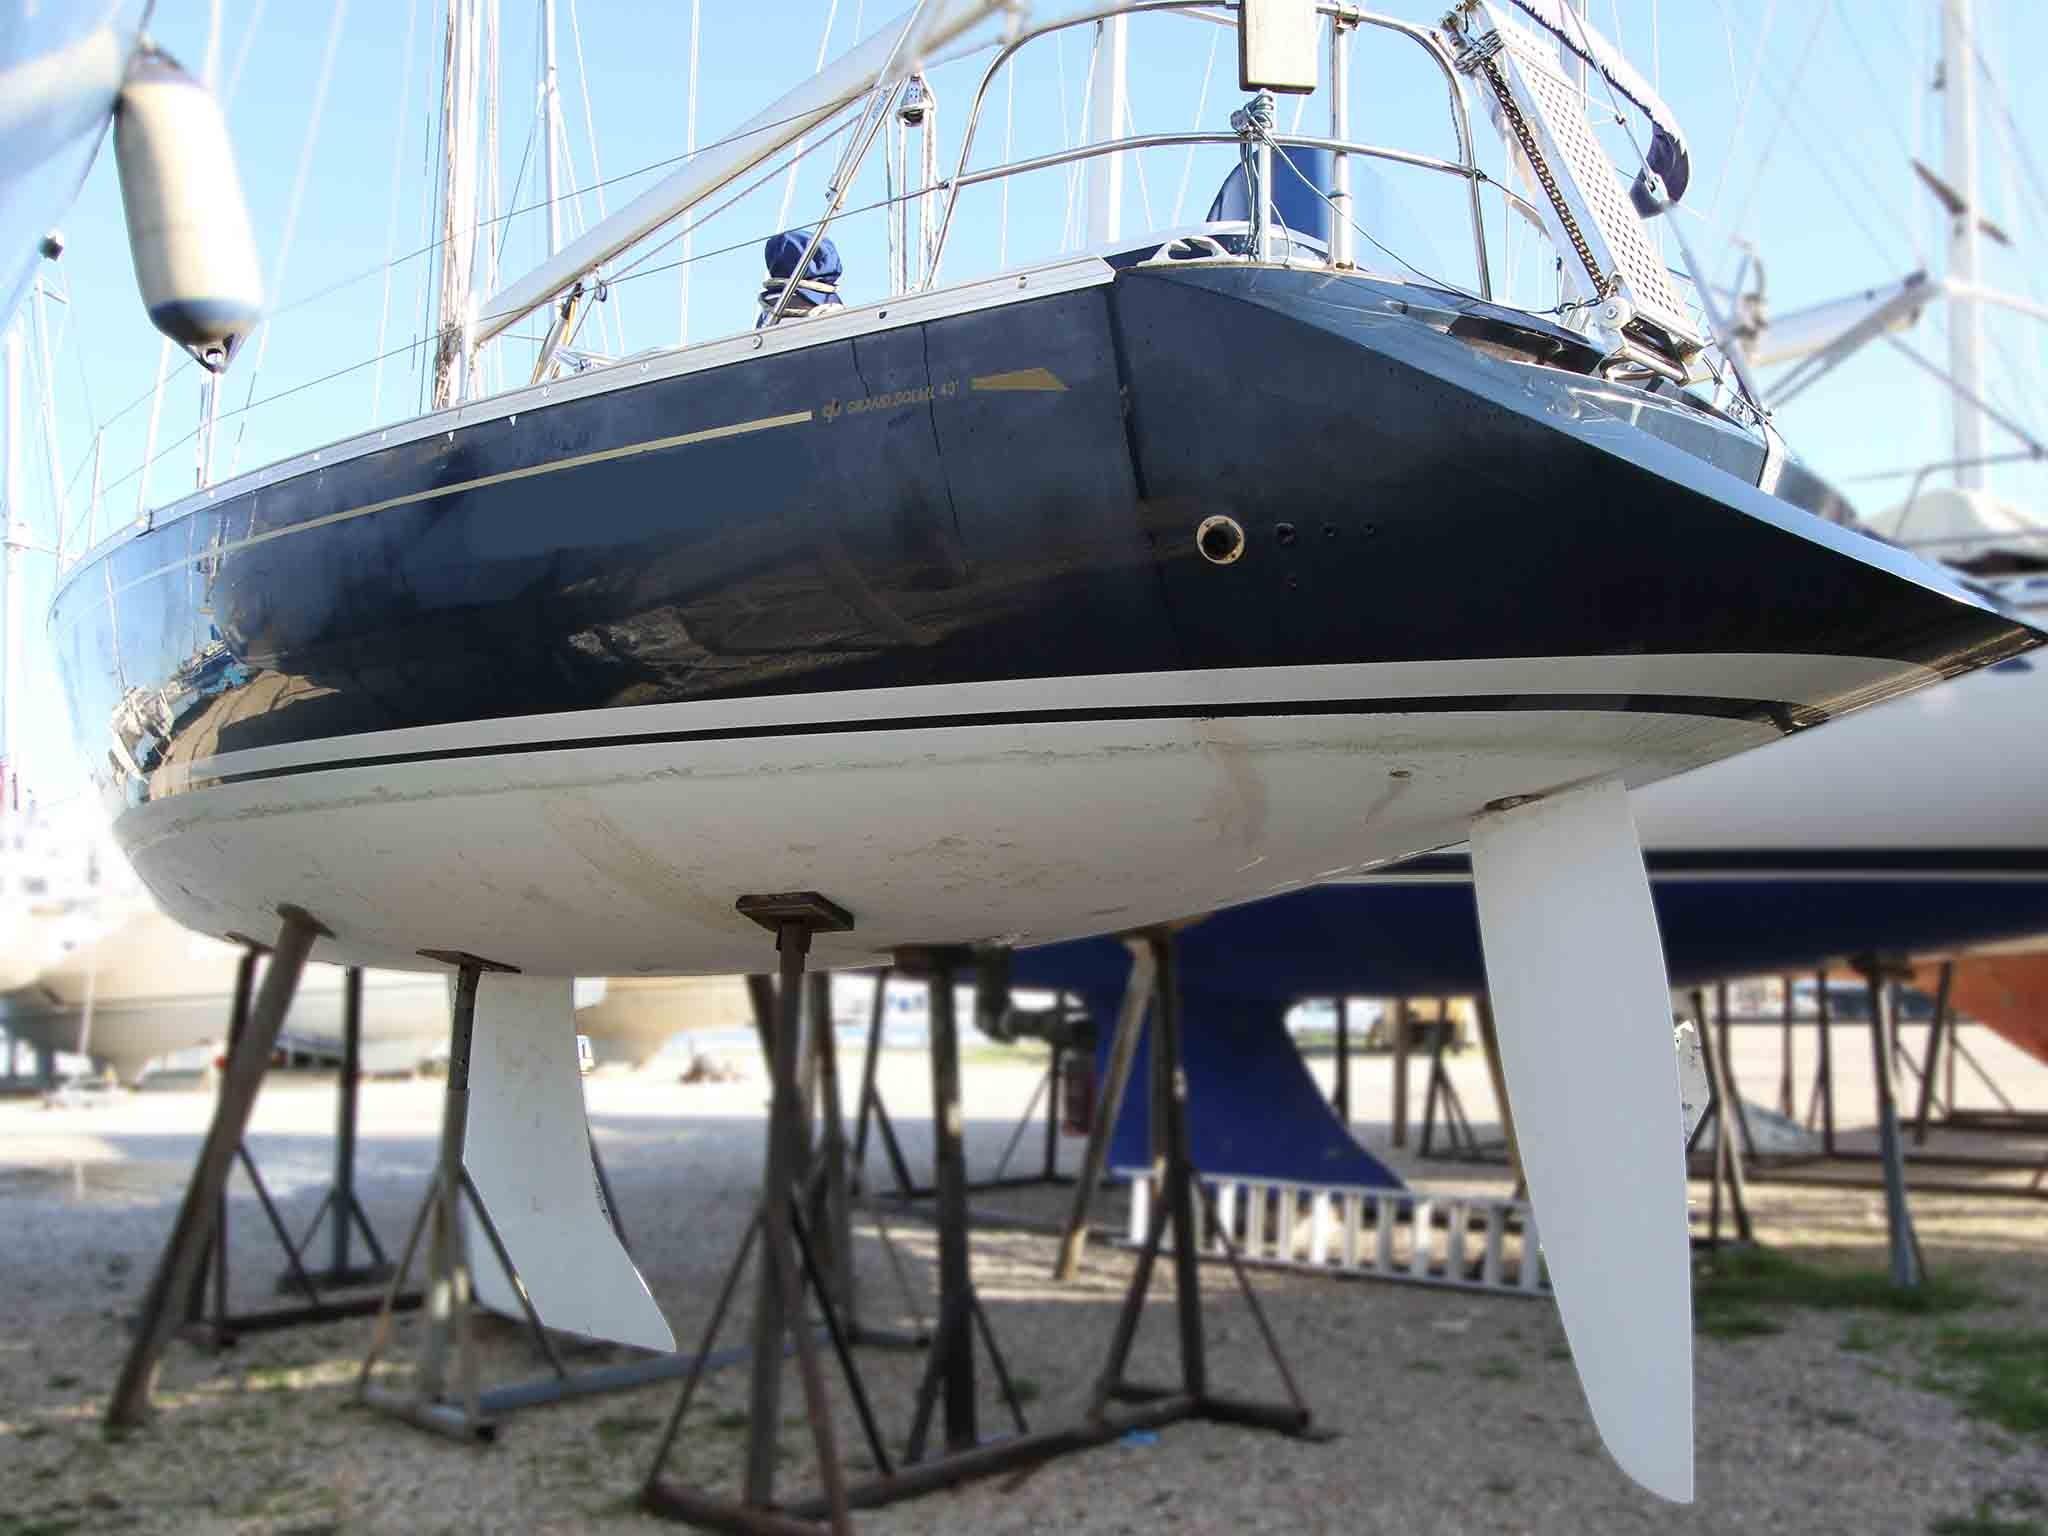 New arrival Grand Soleil 43 JeJ 2003